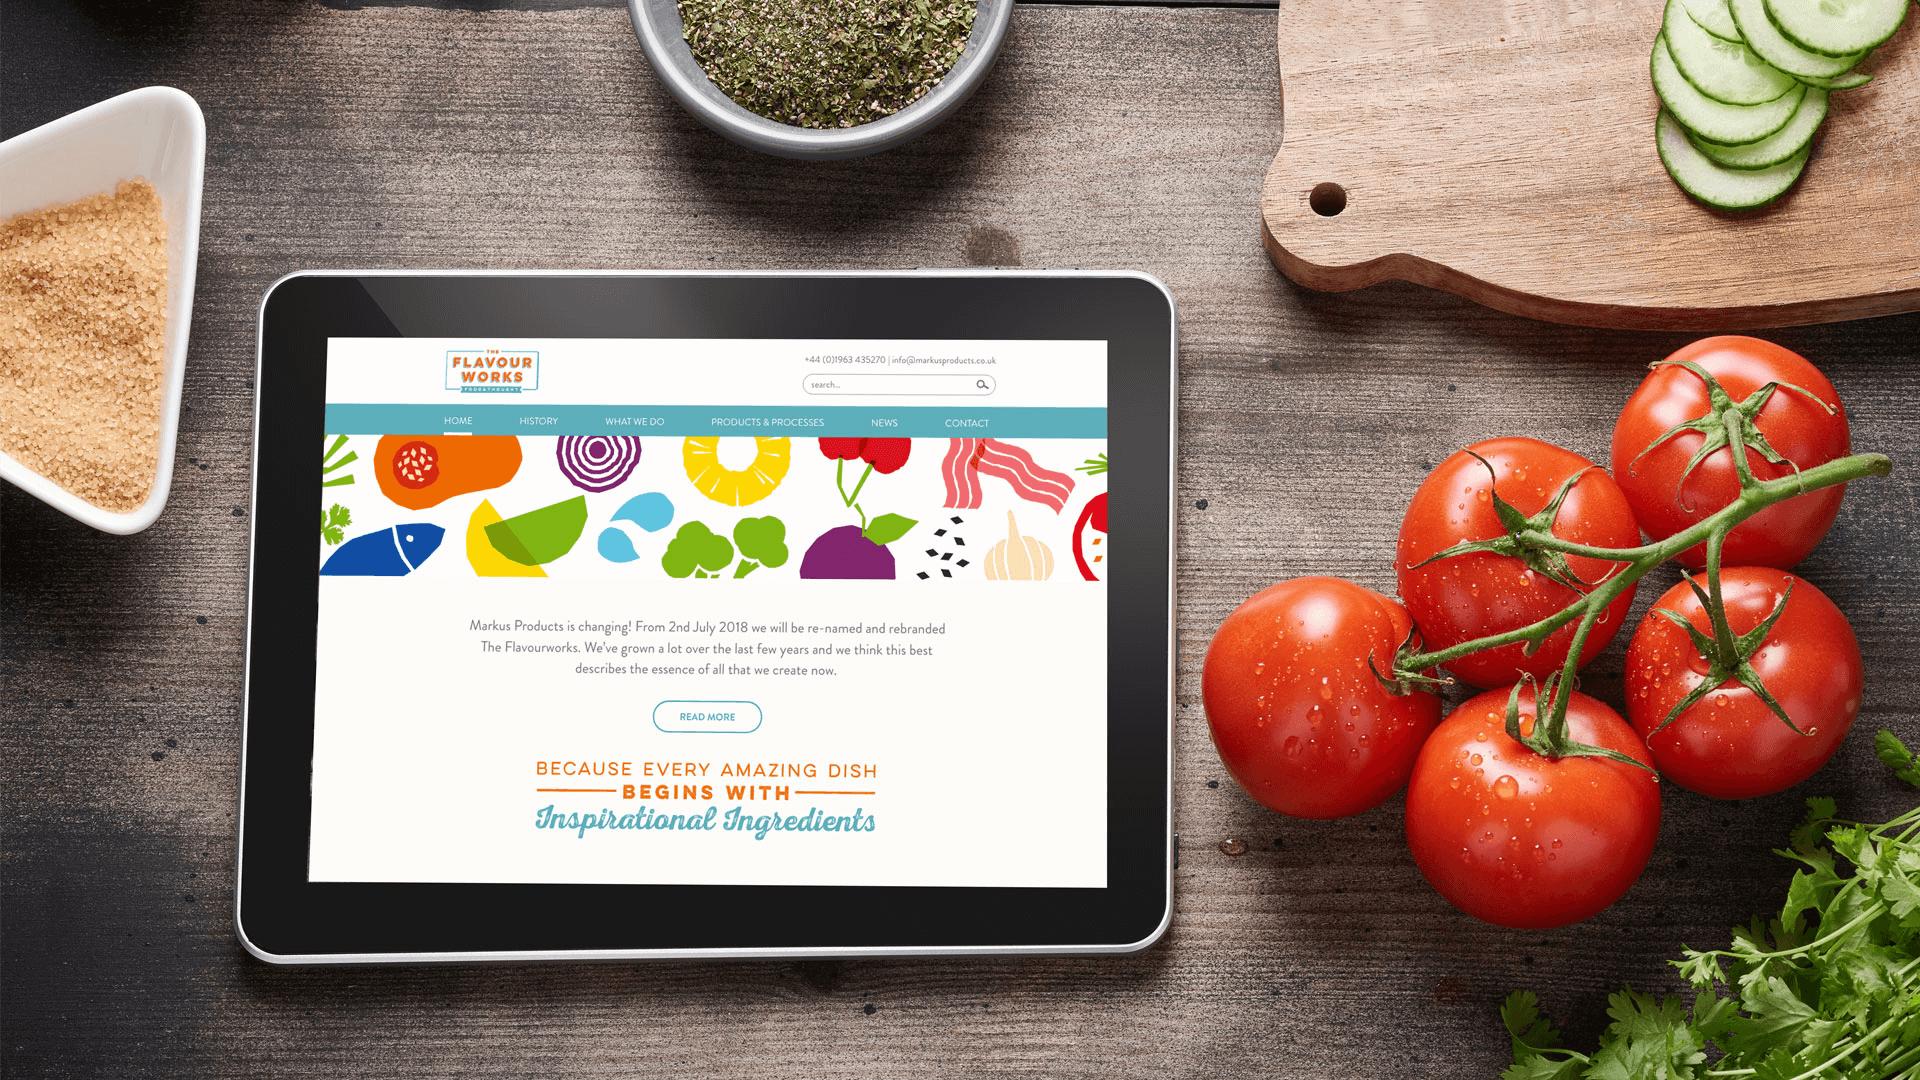 Flavourworks web page mockup